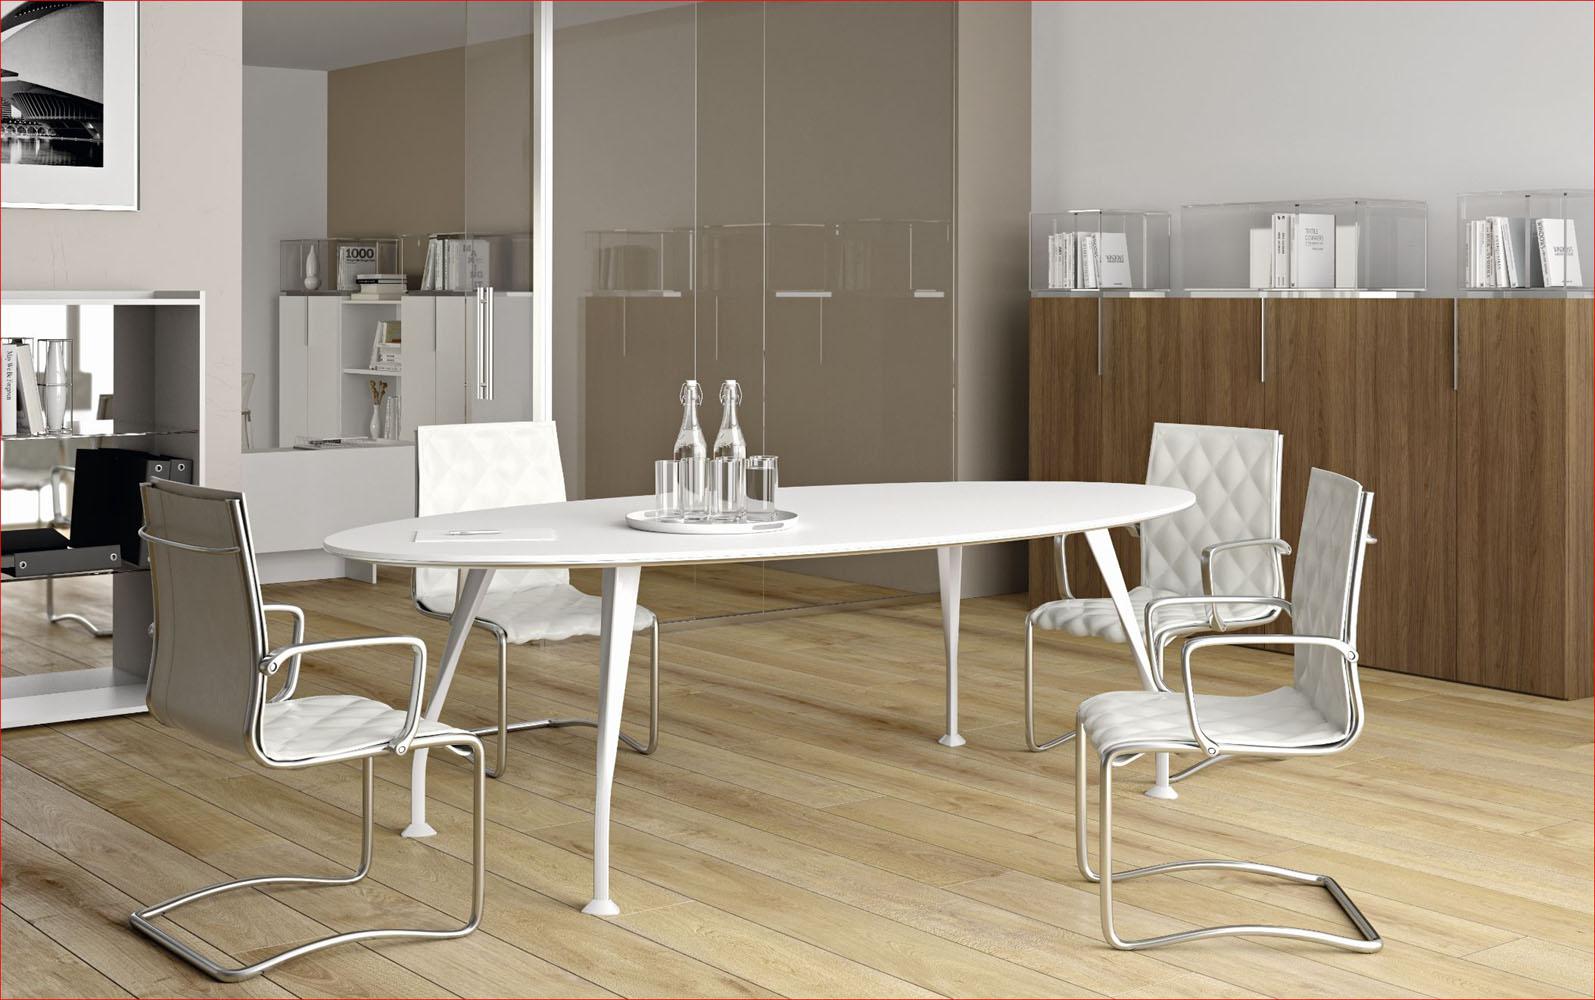 bureau et table en verre luxe led. Black Bedroom Furniture Sets. Home Design Ideas